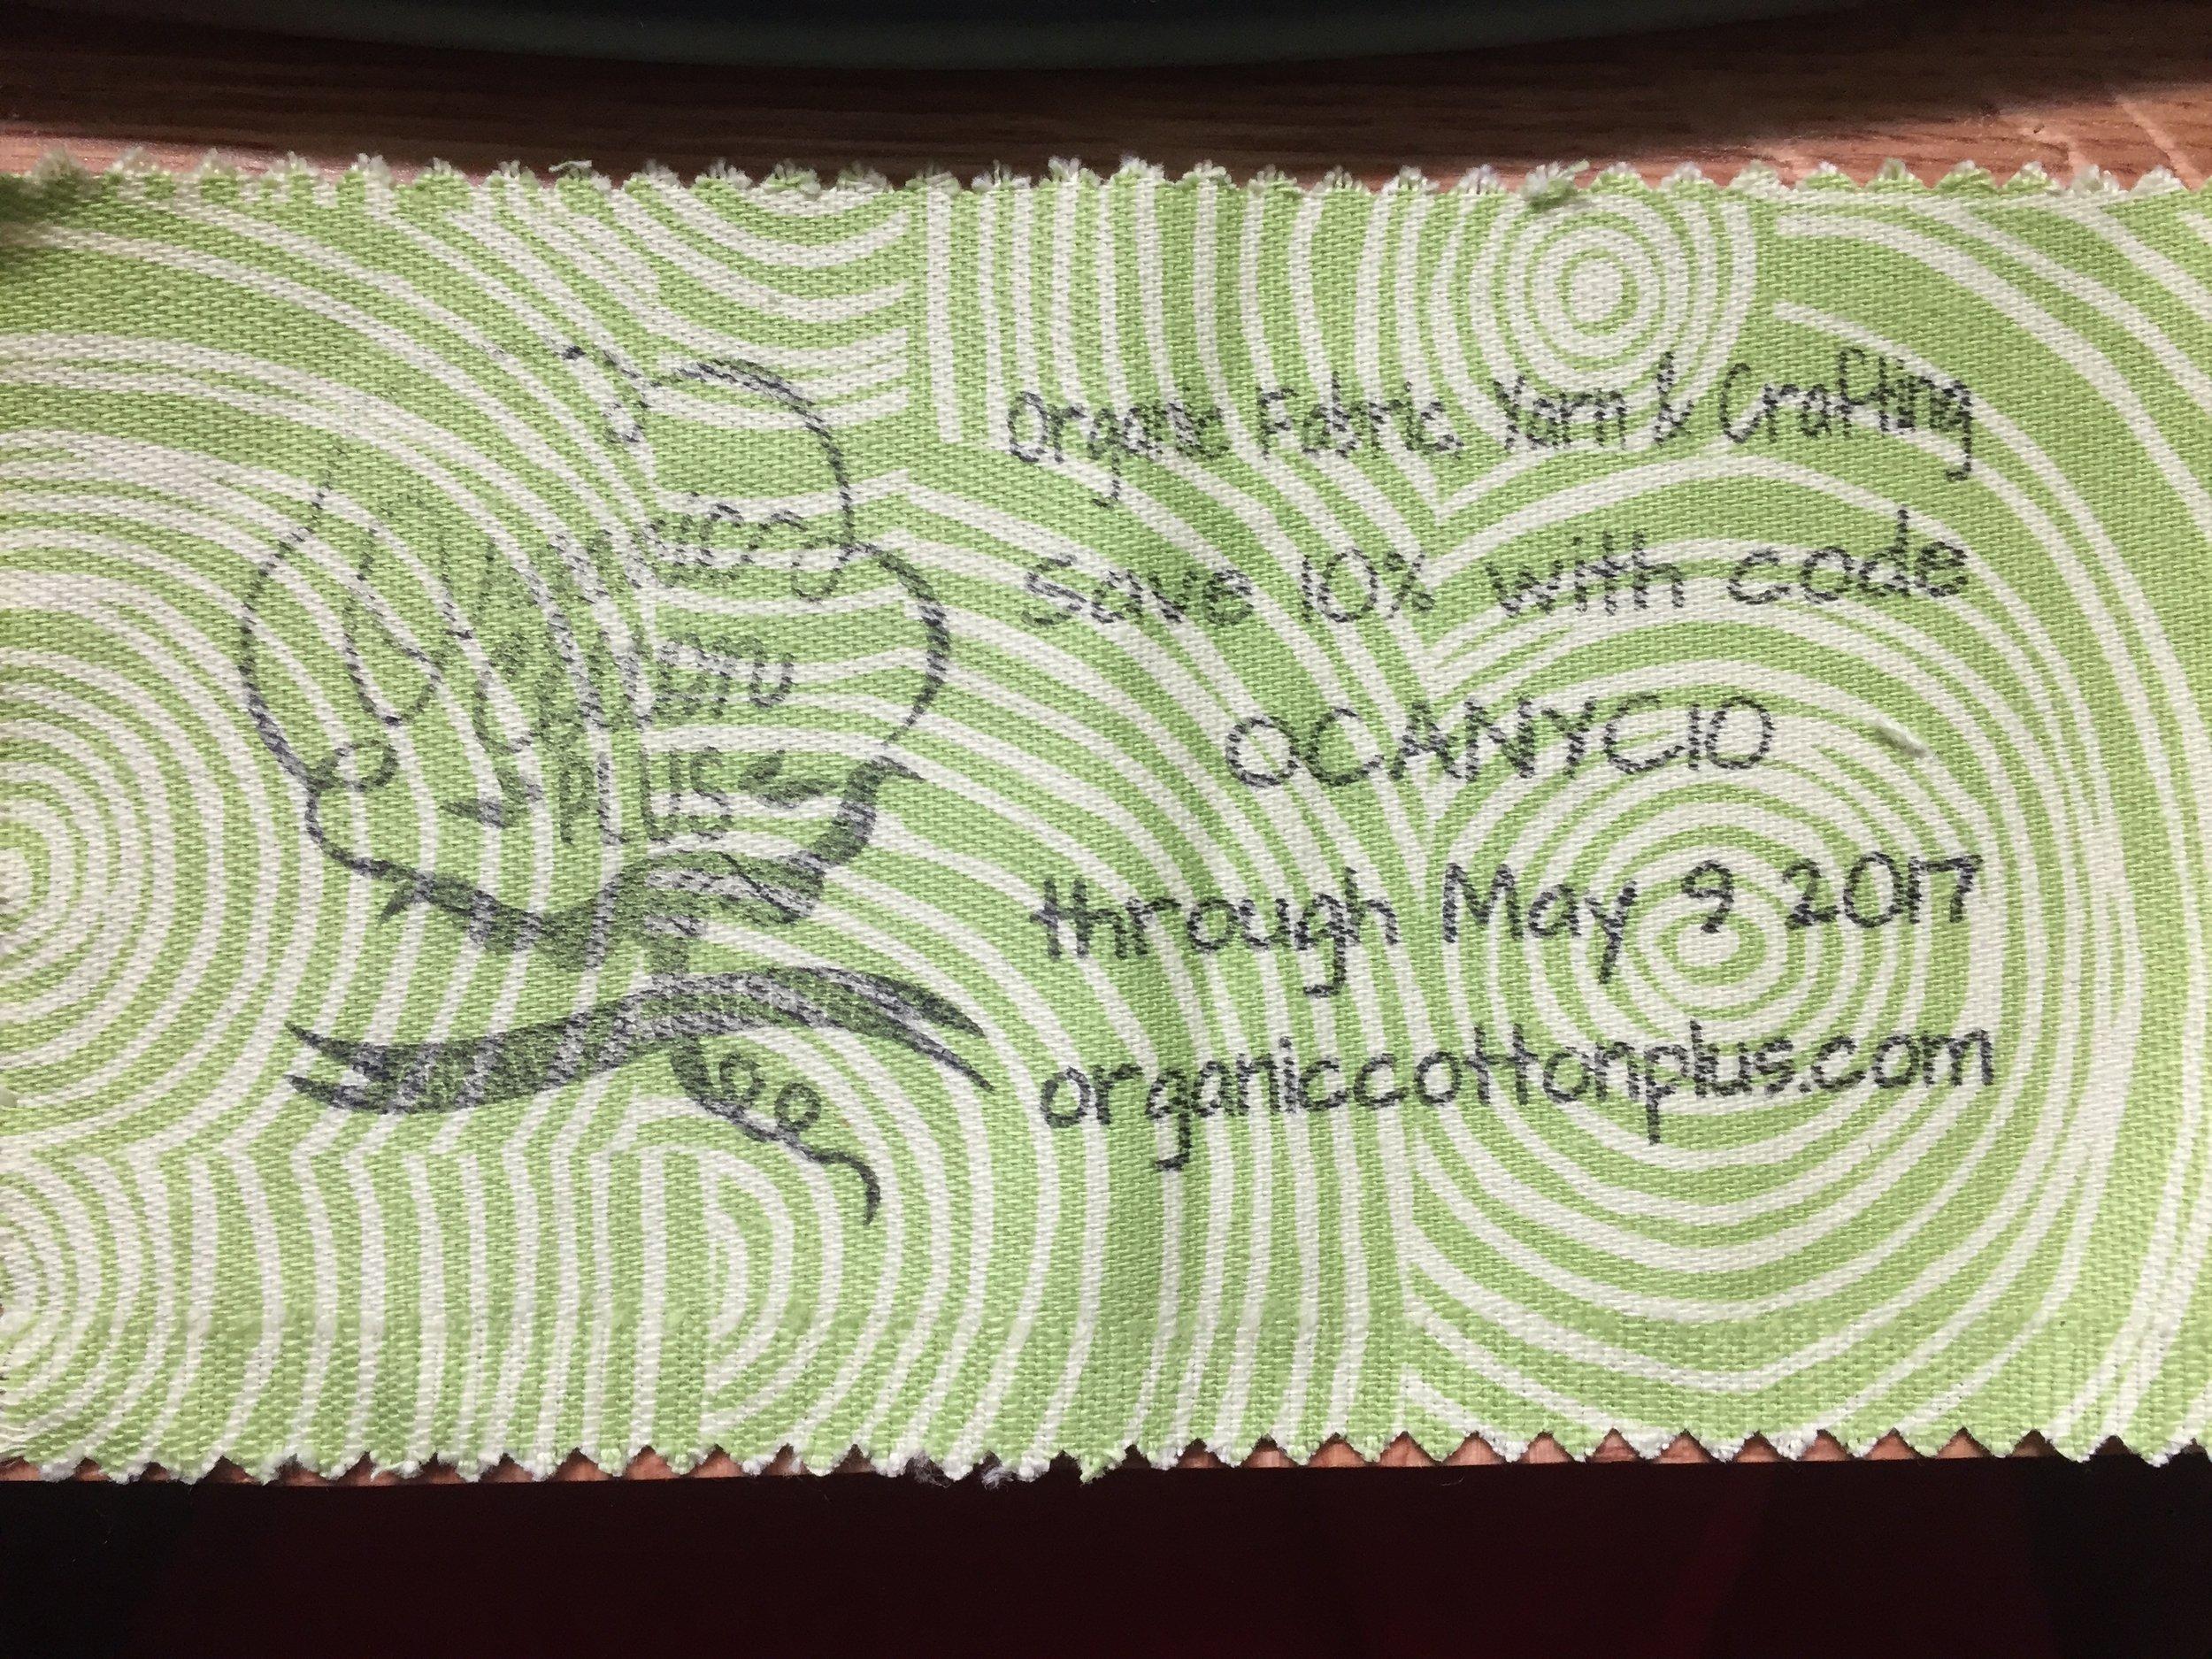 organic-cotton-plus-coupon